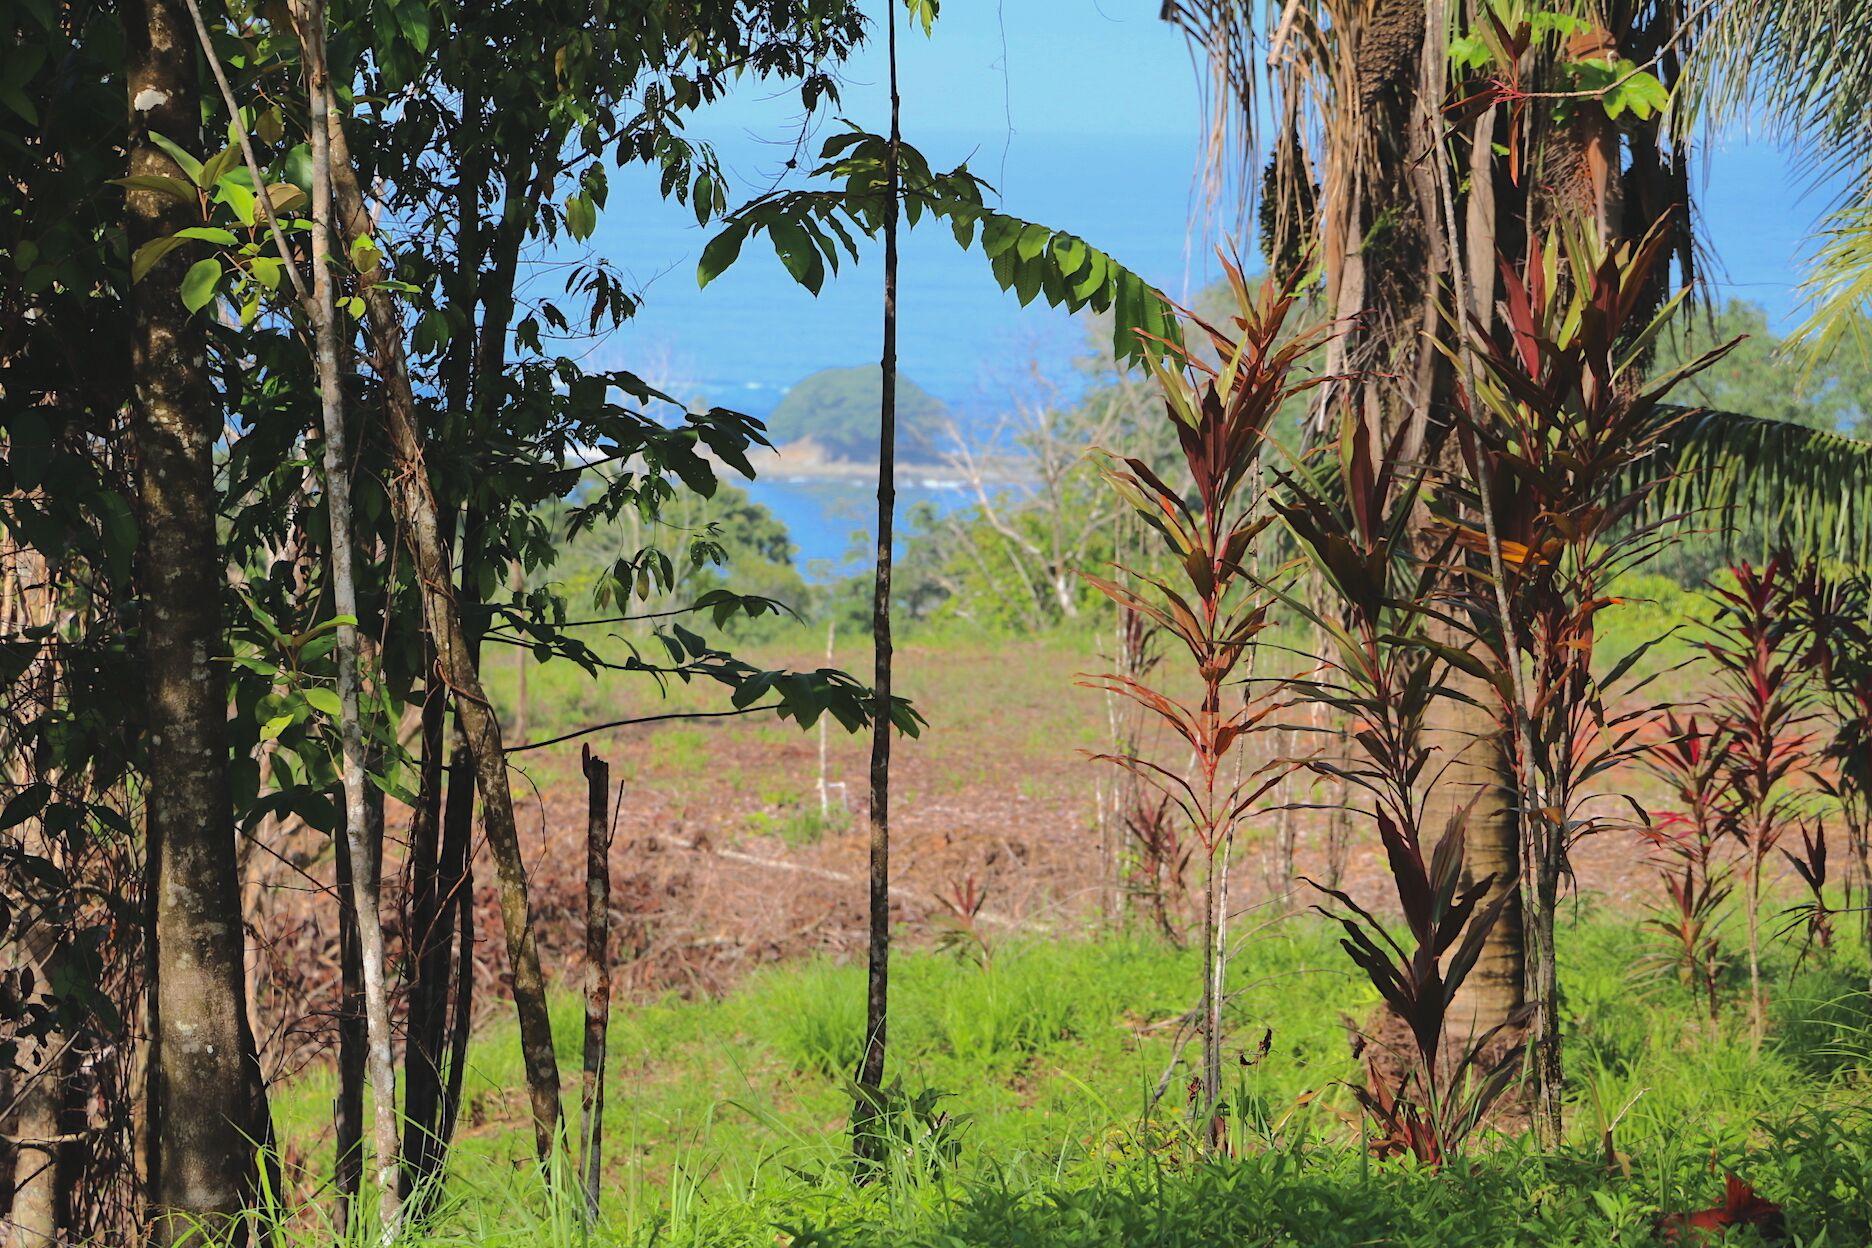 Dominical-Costa-Rica-property-costaricarealestateDOM335-11.jpeg